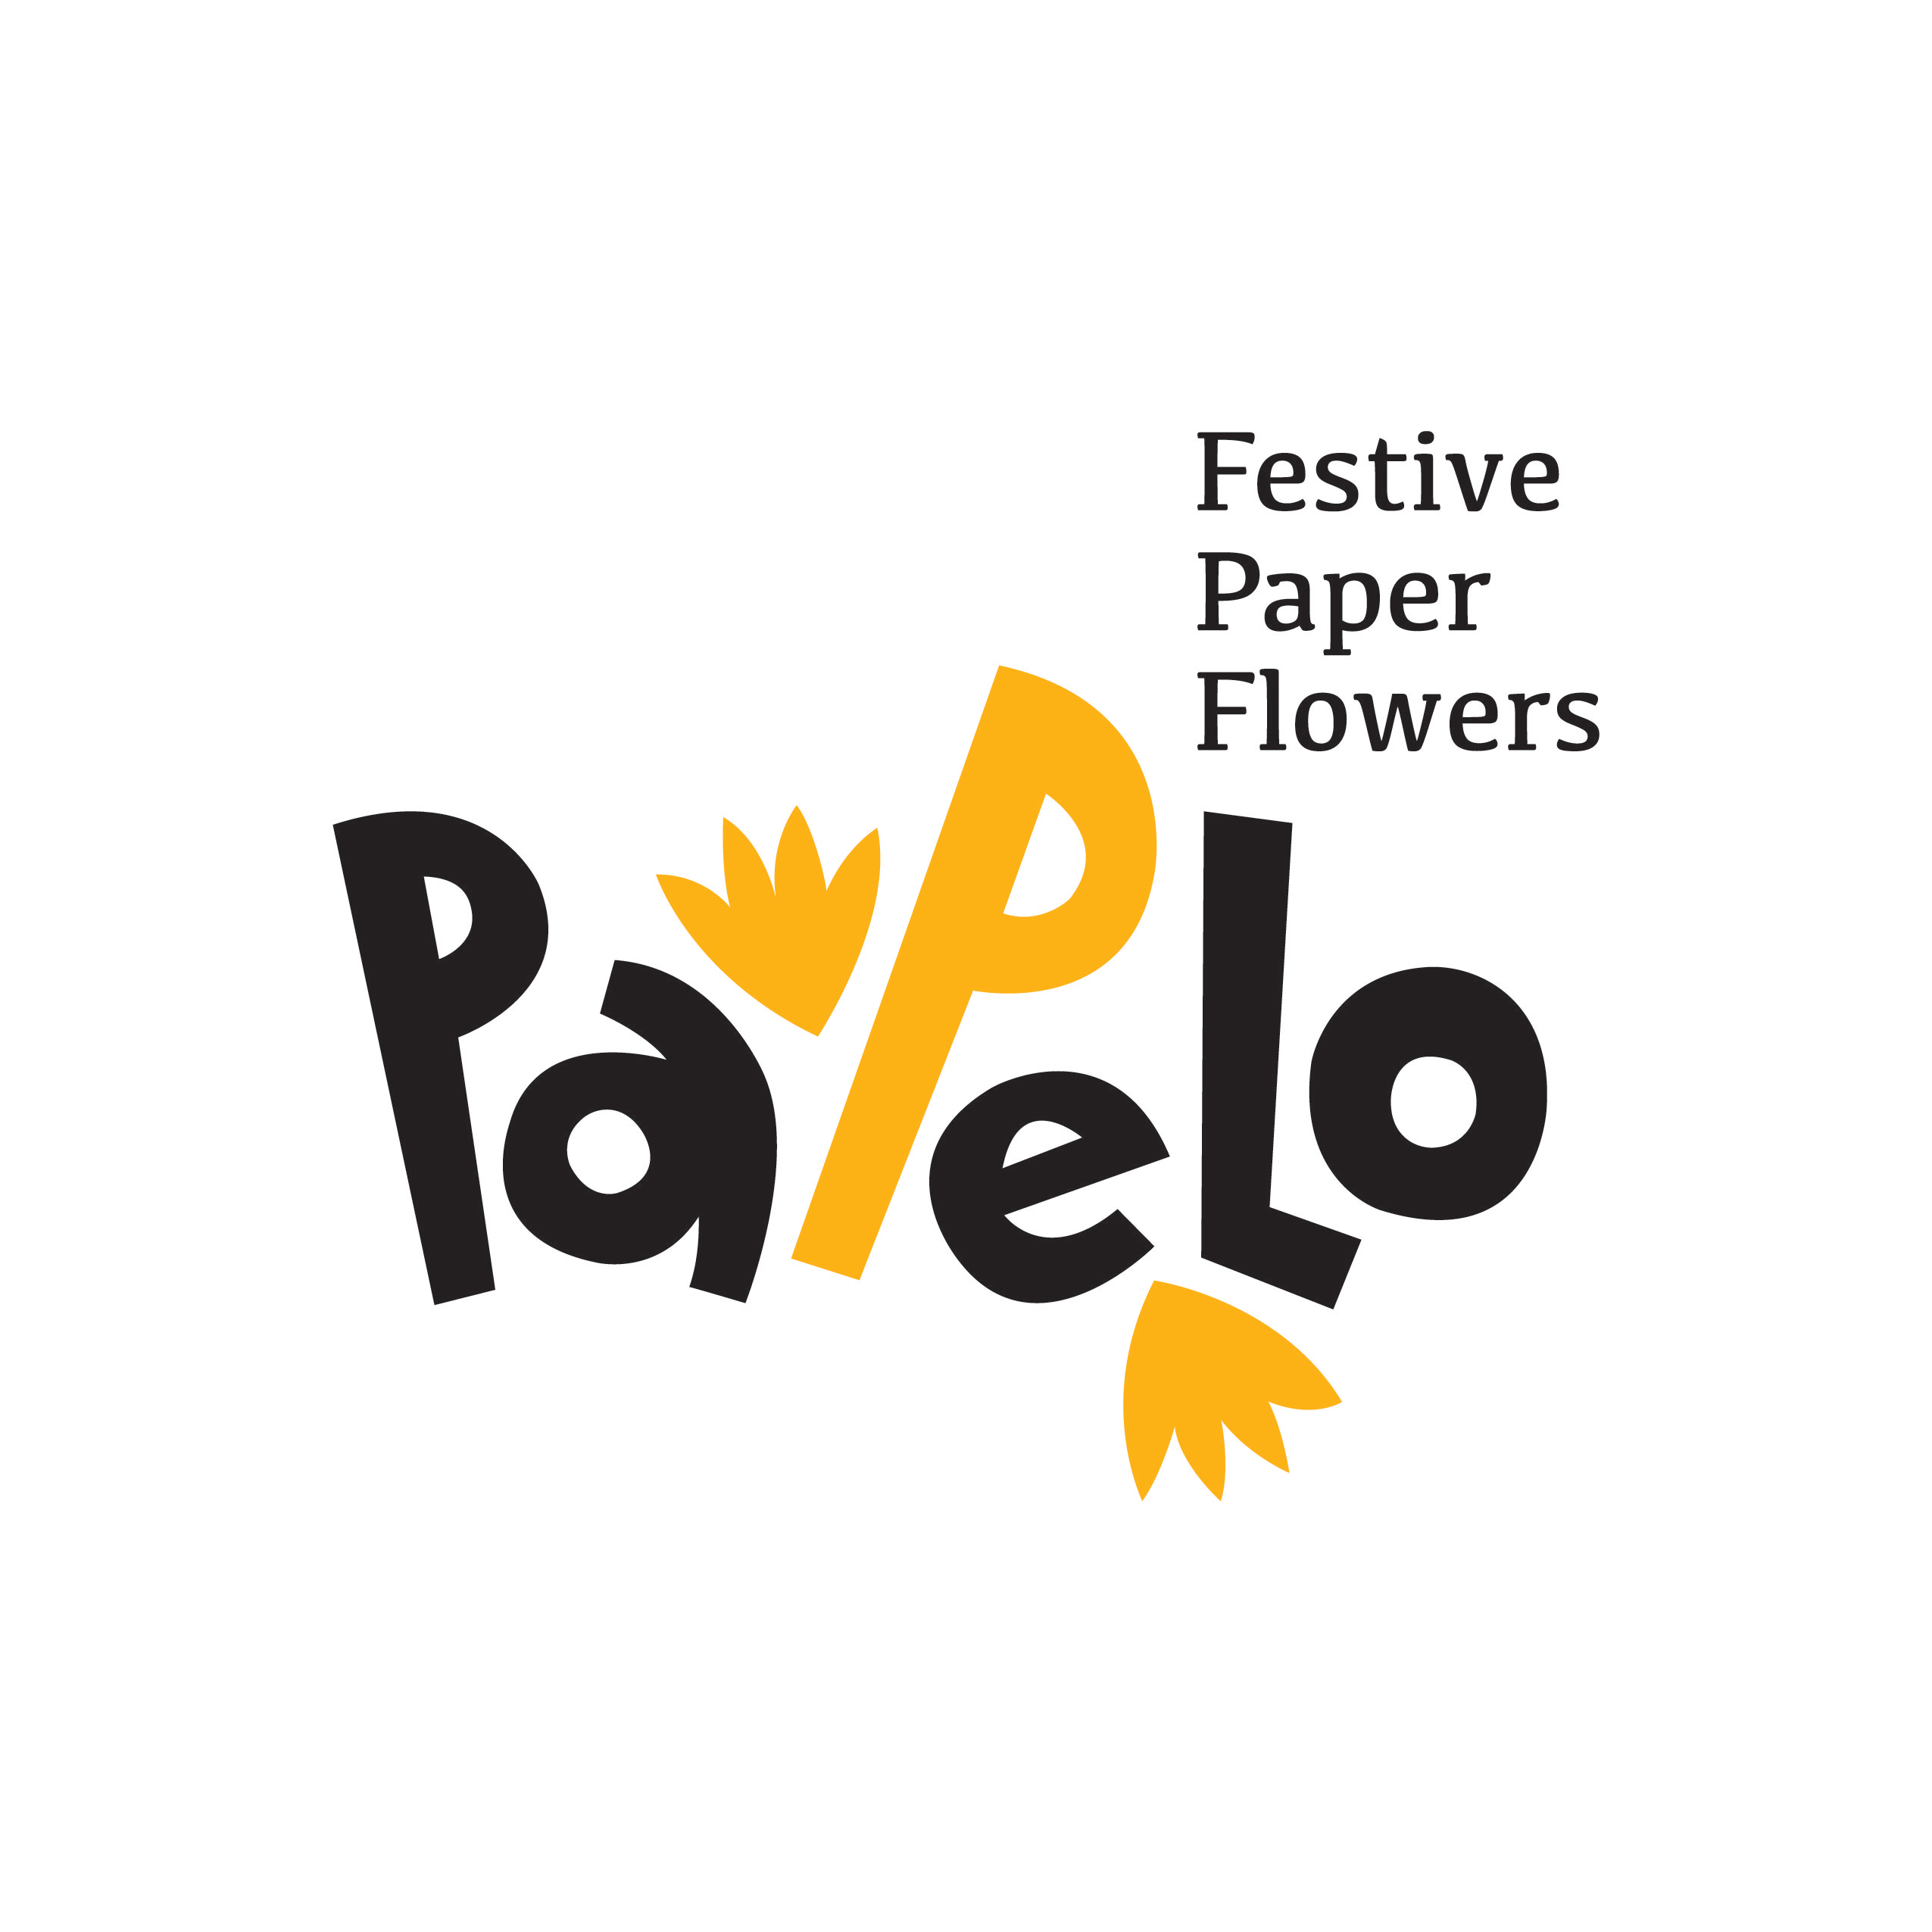 PaPelo – Festive Paper Flowers